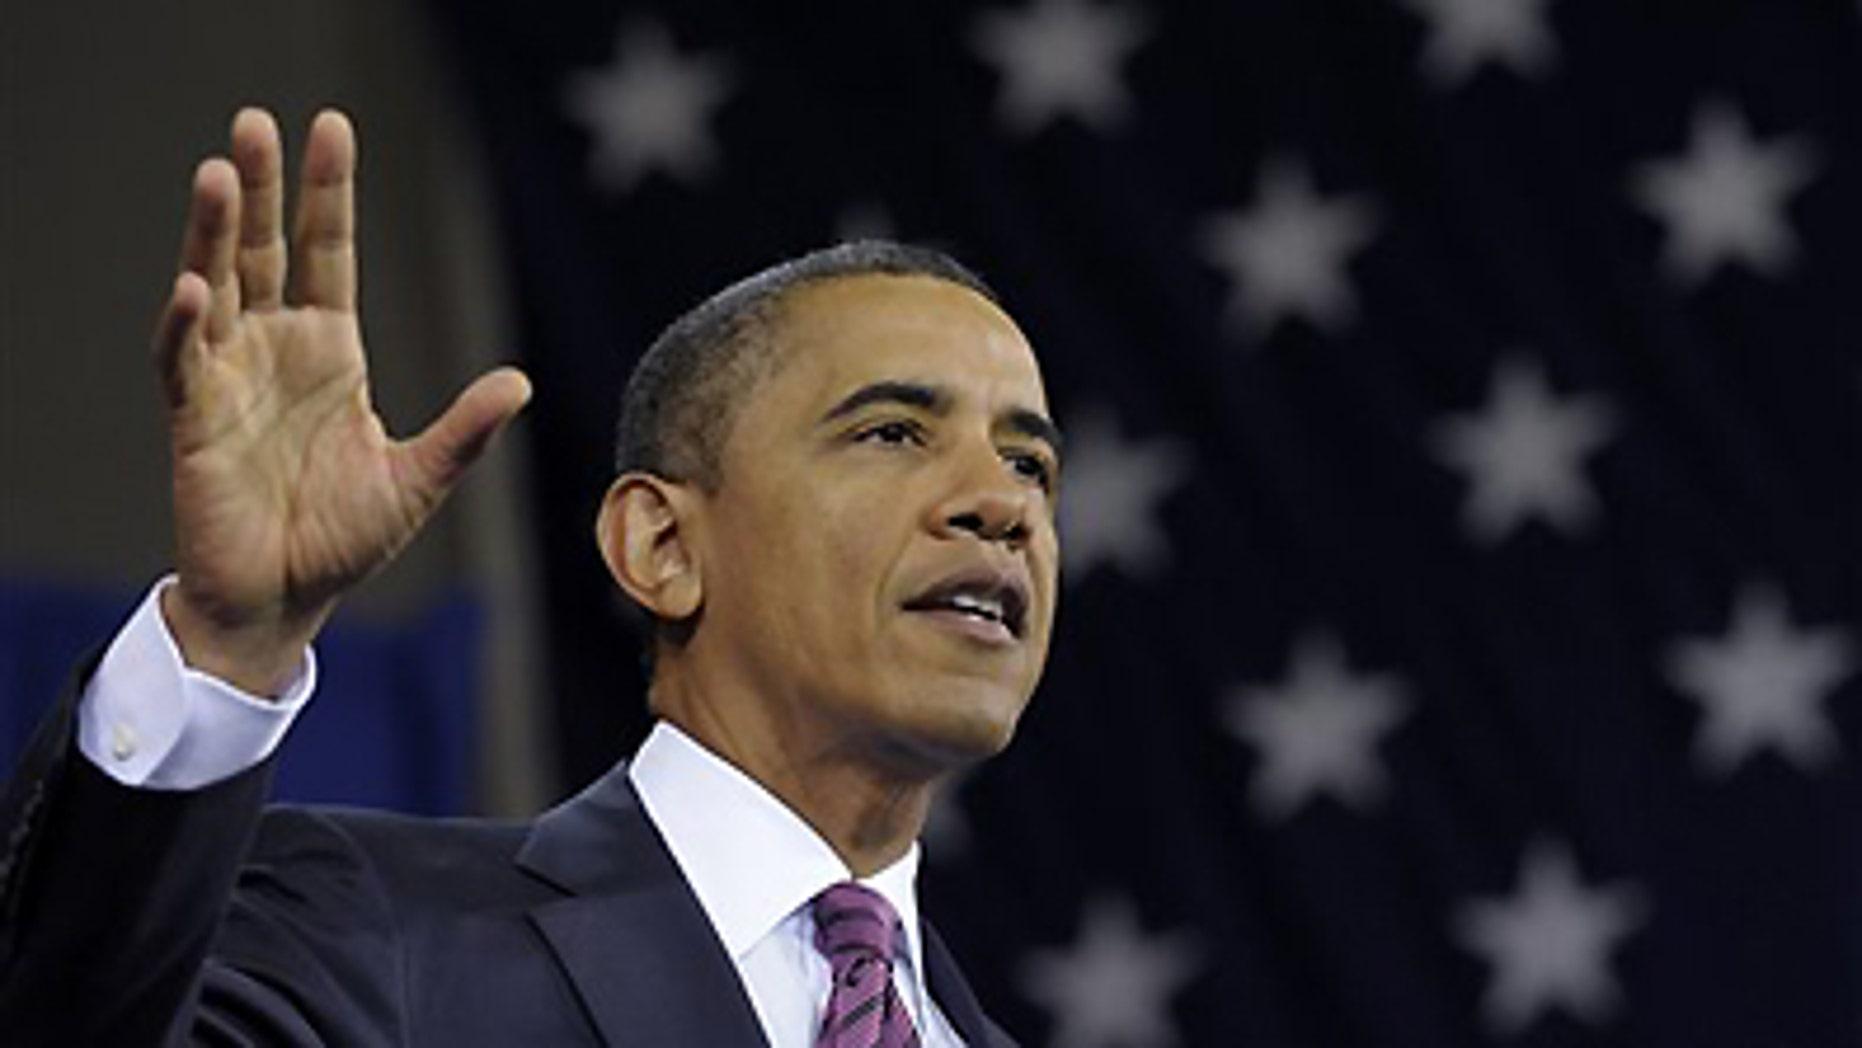 Feb. 1, 2012: President Barack Obama speaks in Falls Church, Va.